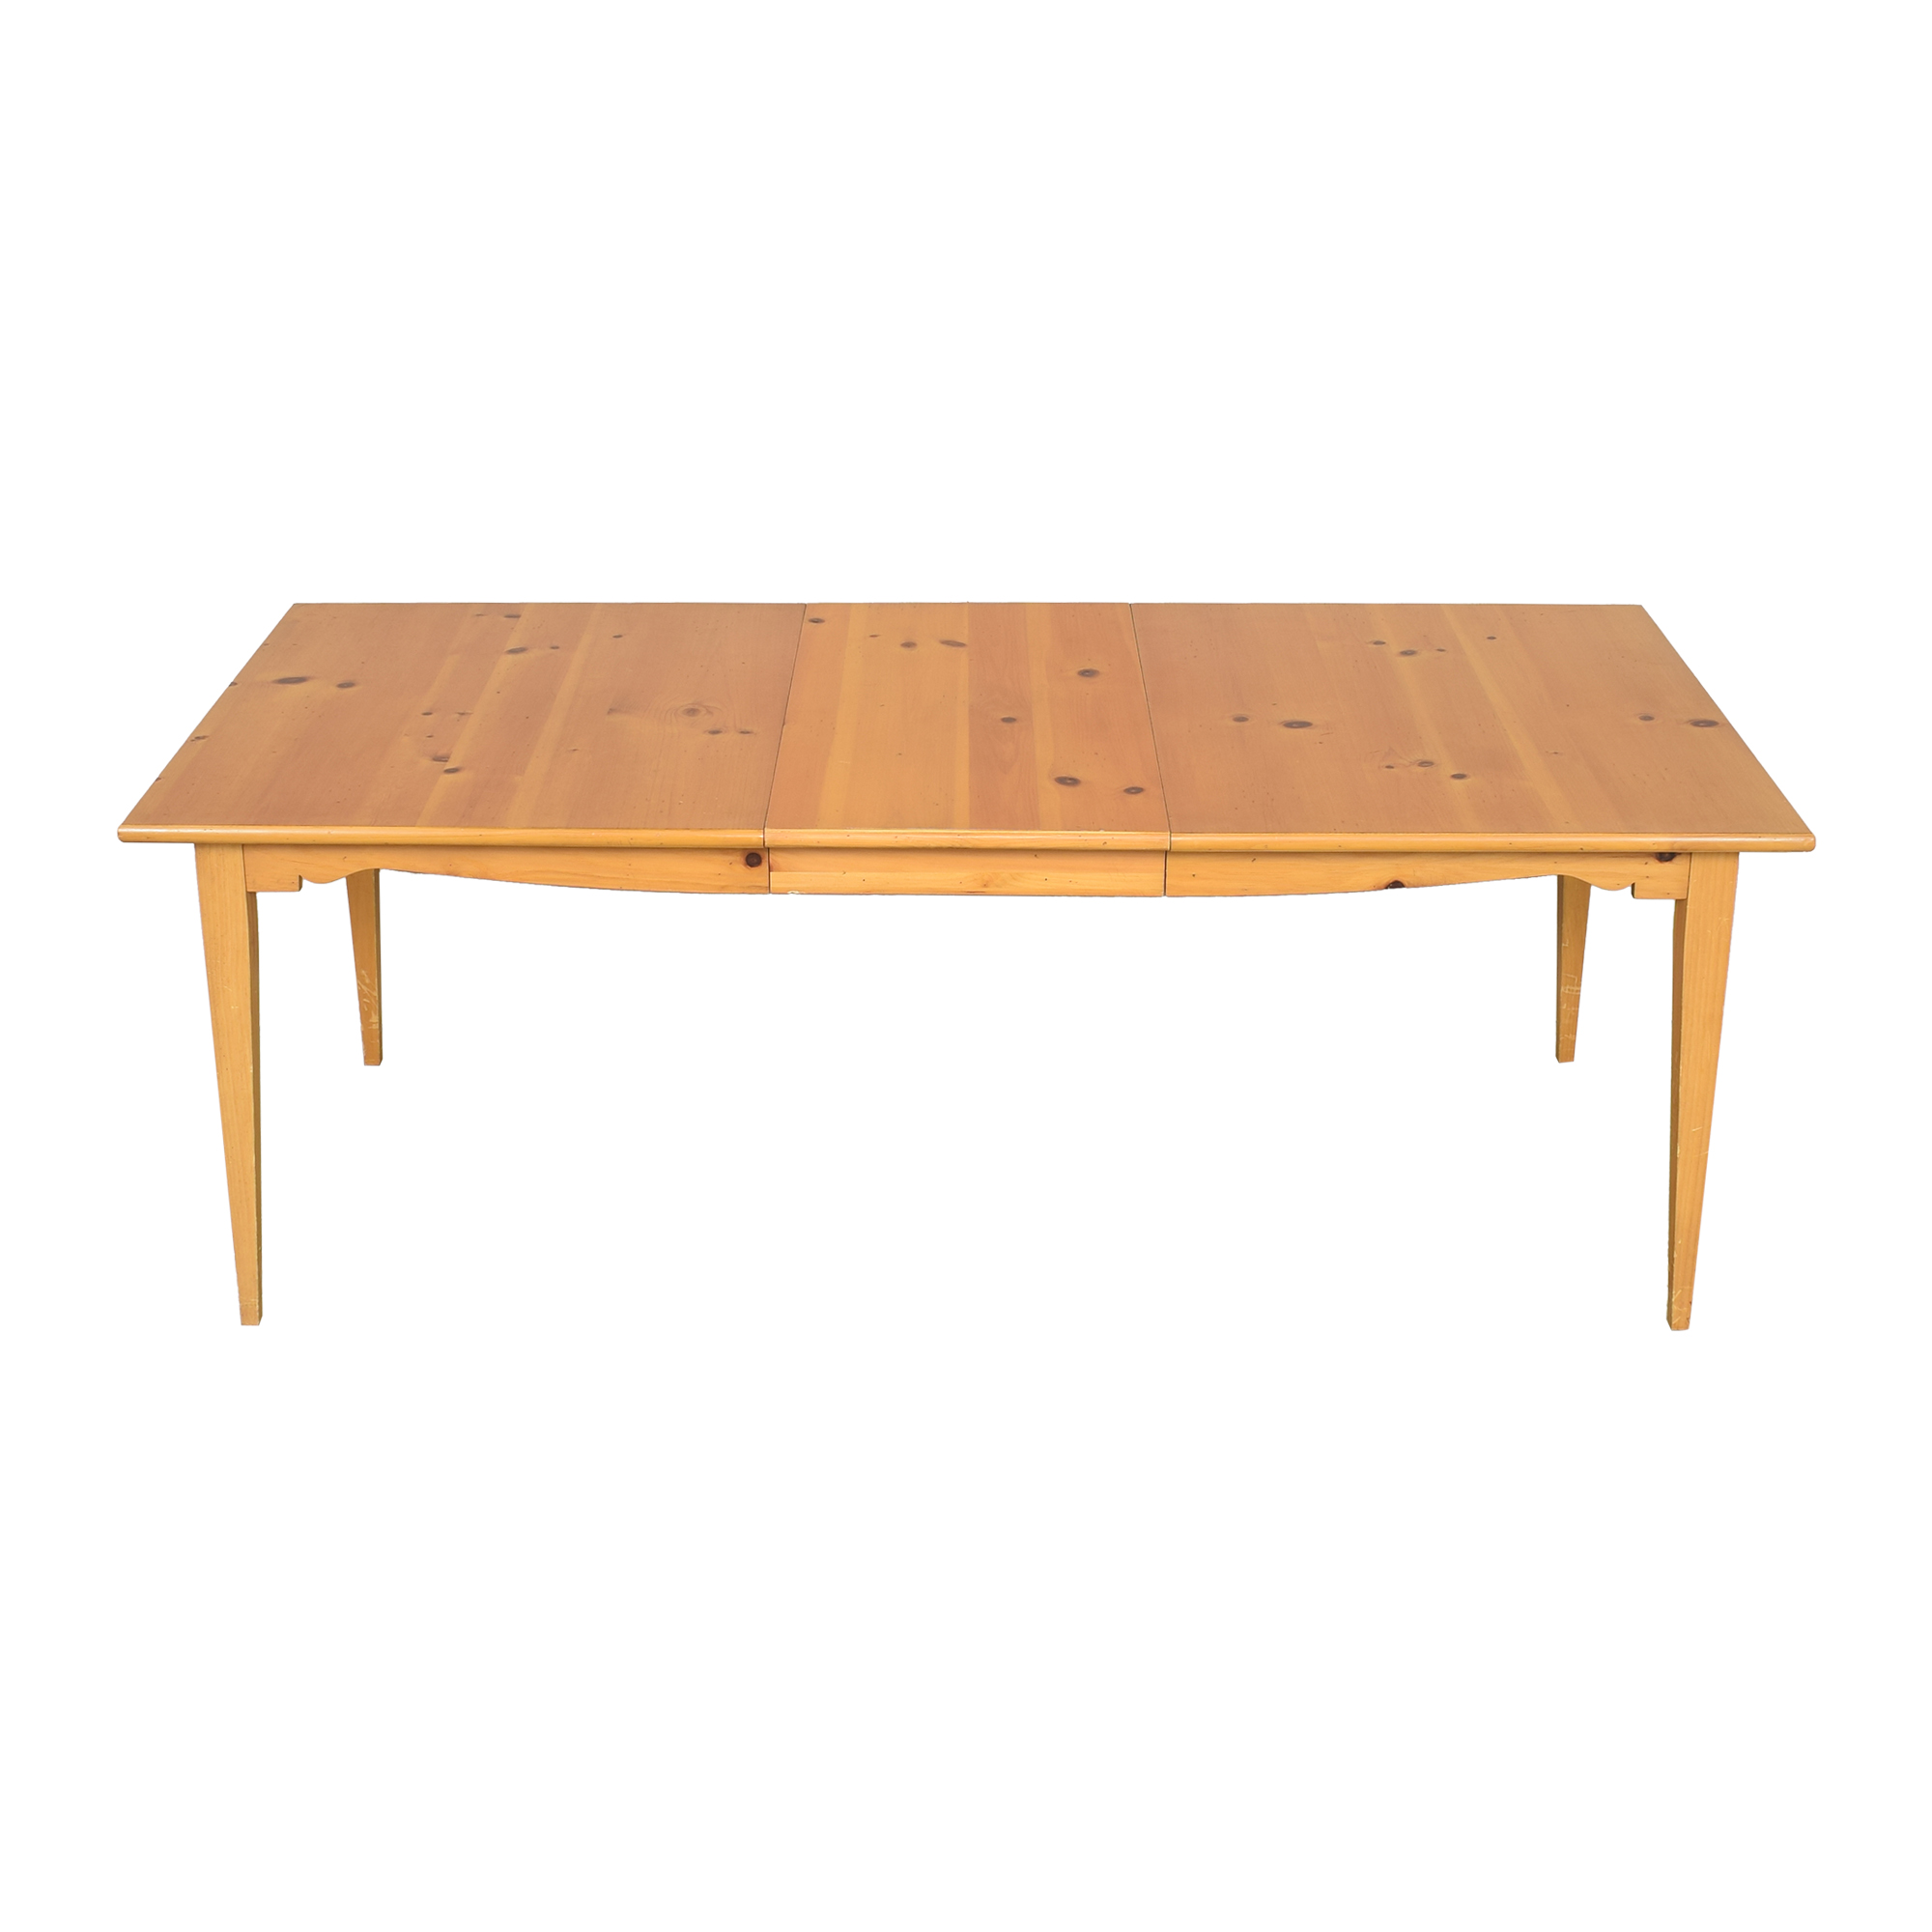 Lane Furniture Lane Extendable Rectangular Dining Table second hand